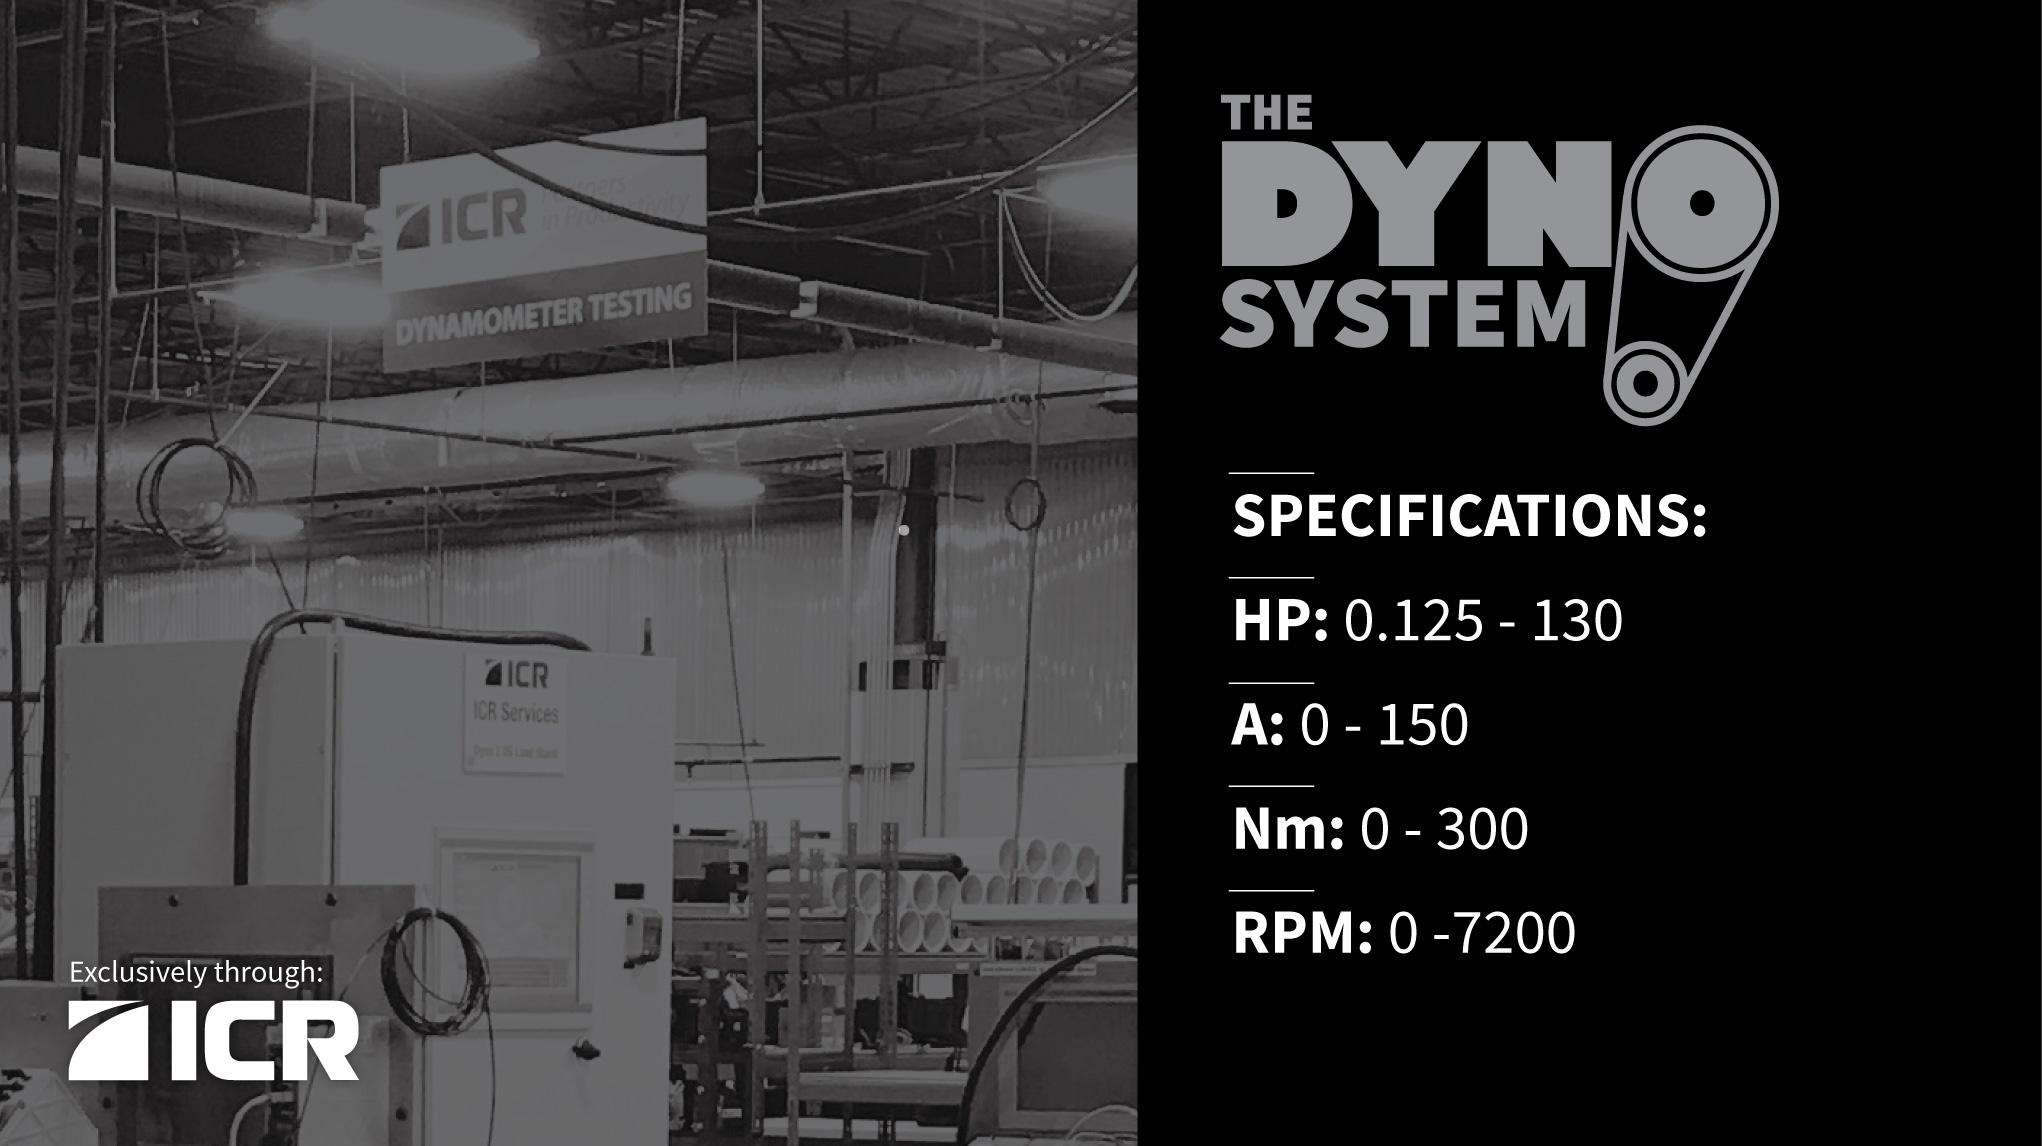 Dyno Test System Specs